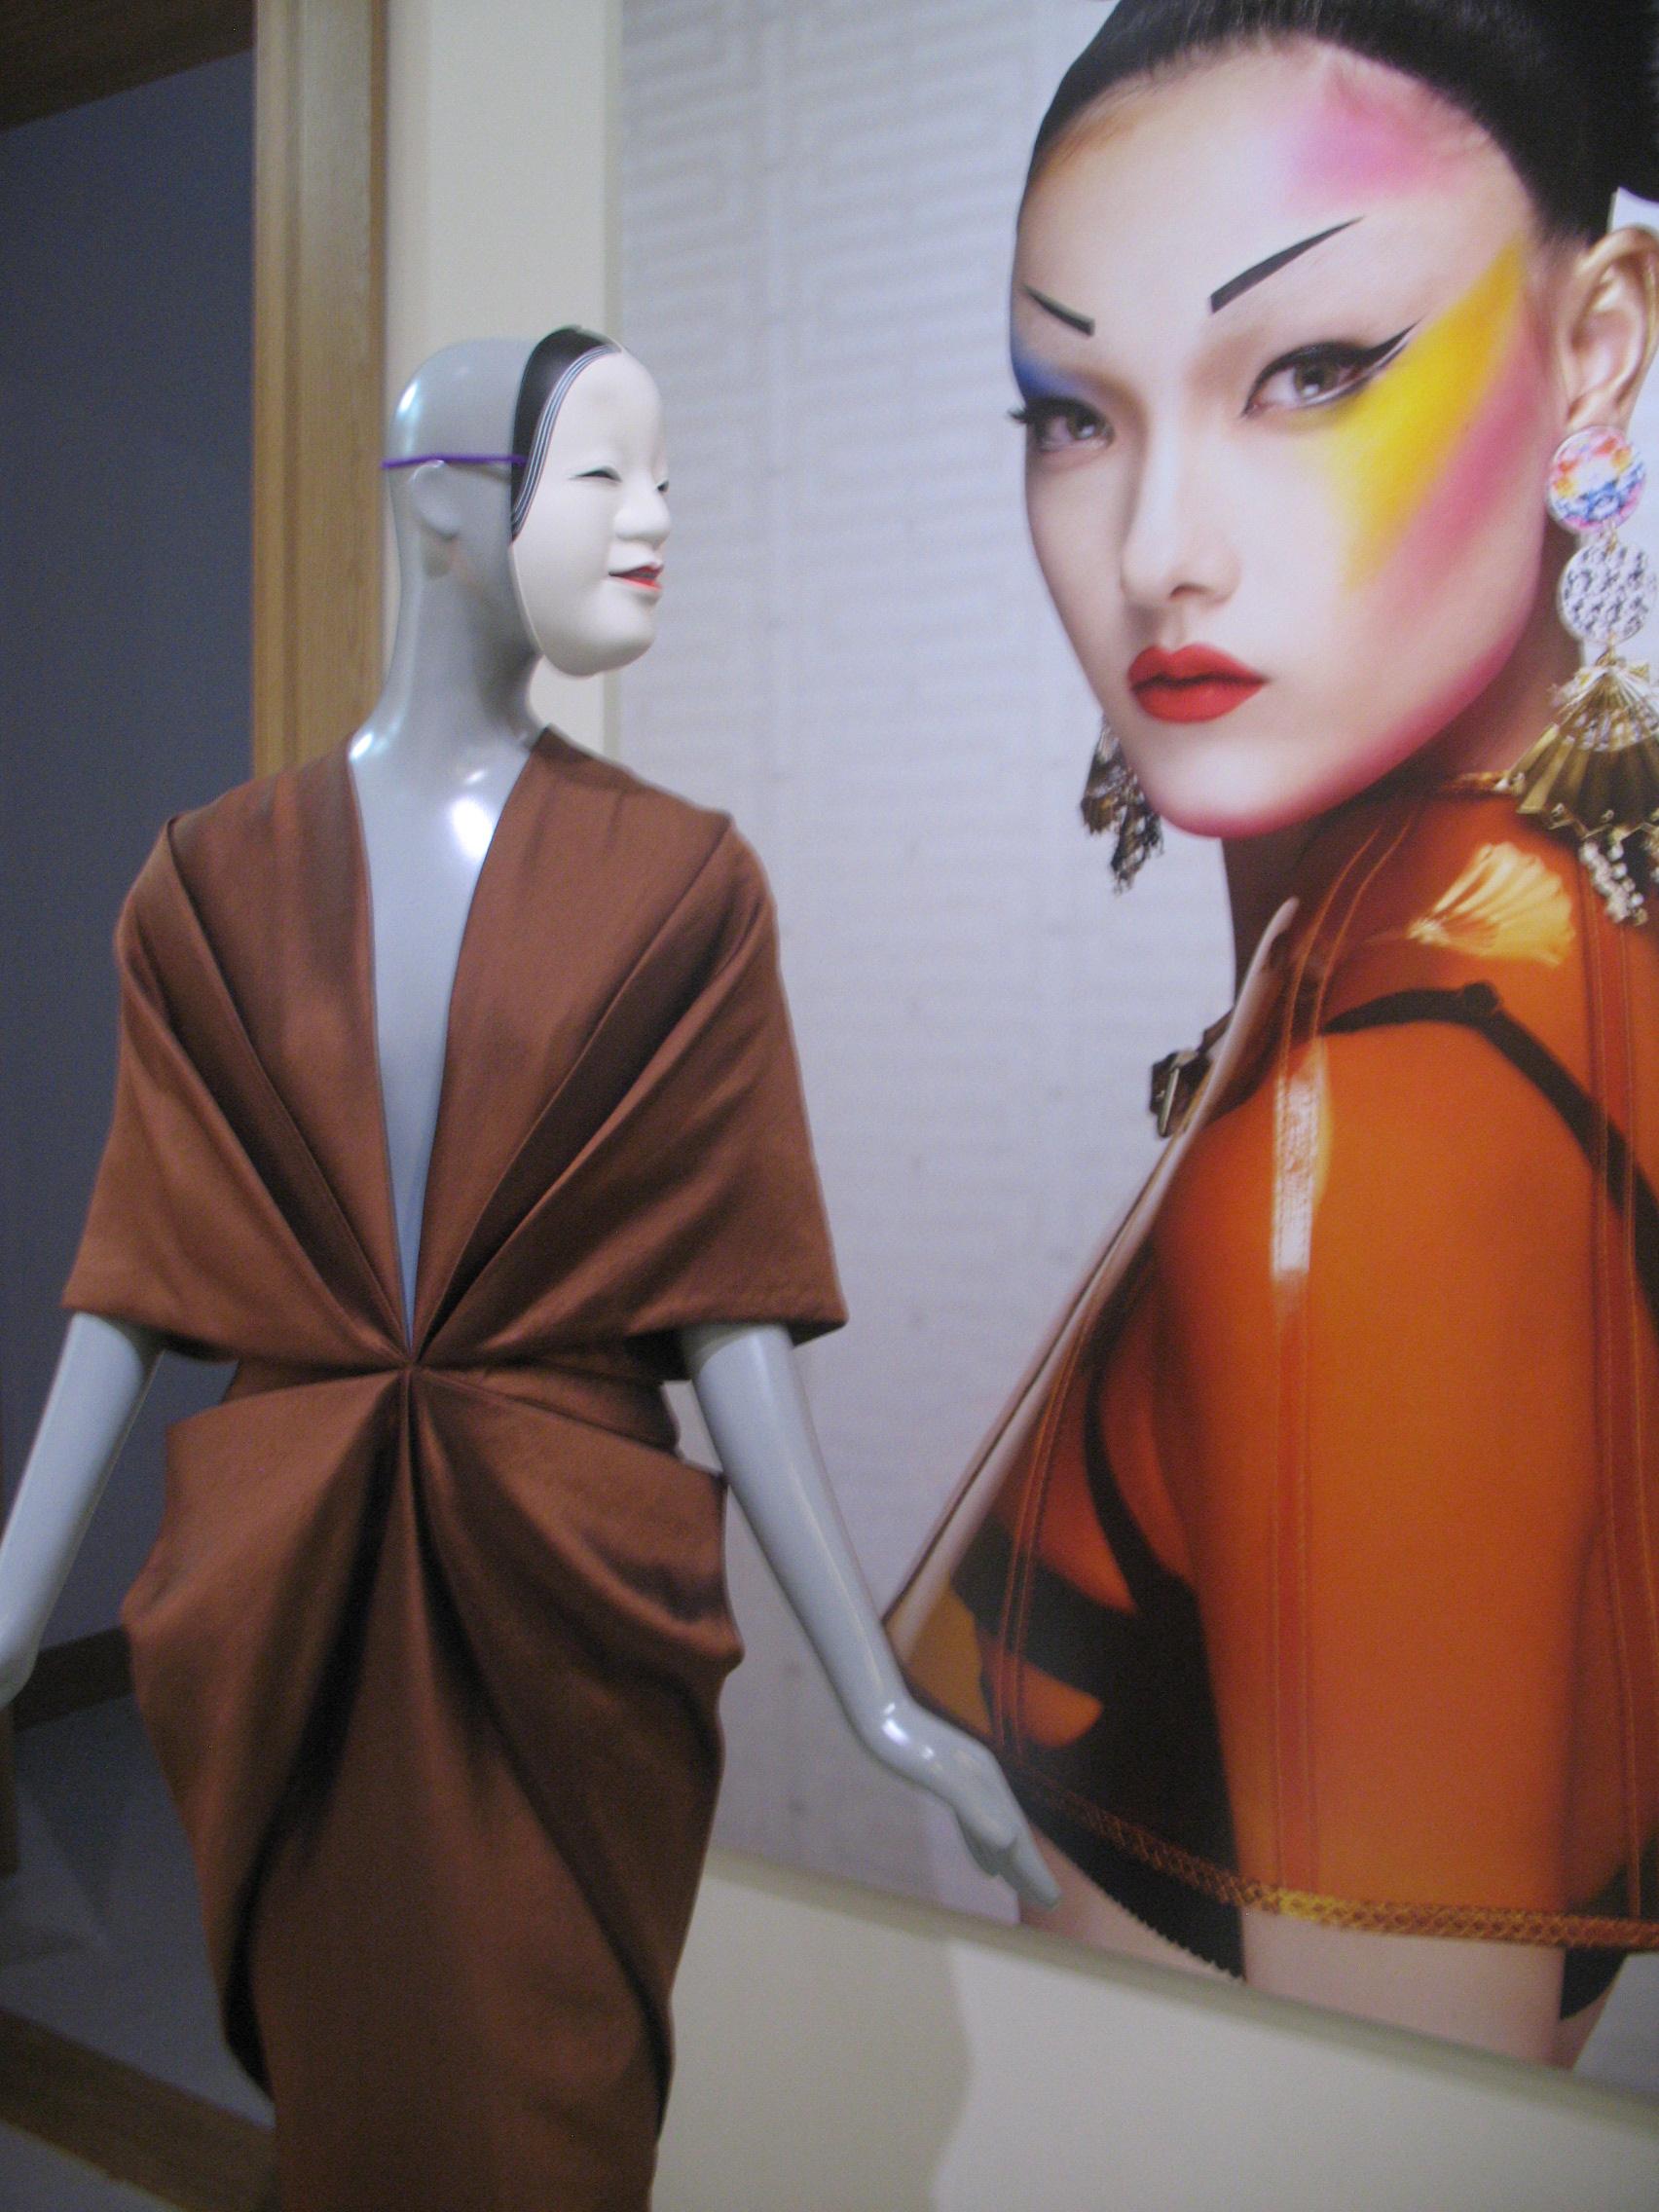 Fetishism in fashion stof tot nadenken janny ter meer - Volwassen kamer trend ...